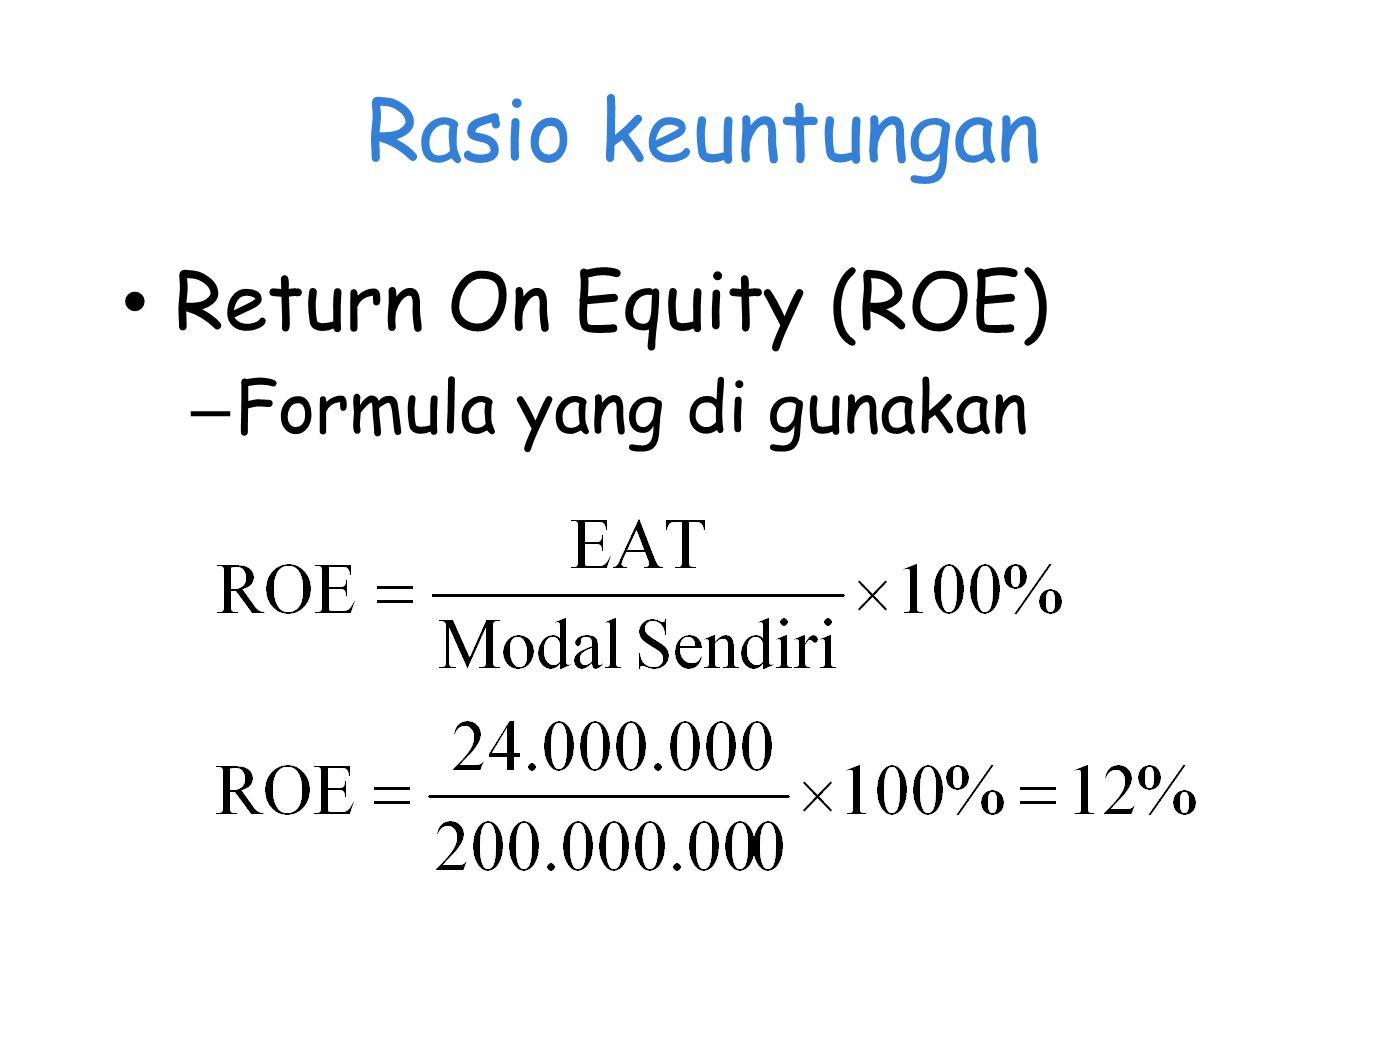 Rasio keuntungan Return On Equity (ROE) – Formula yang di gunakan